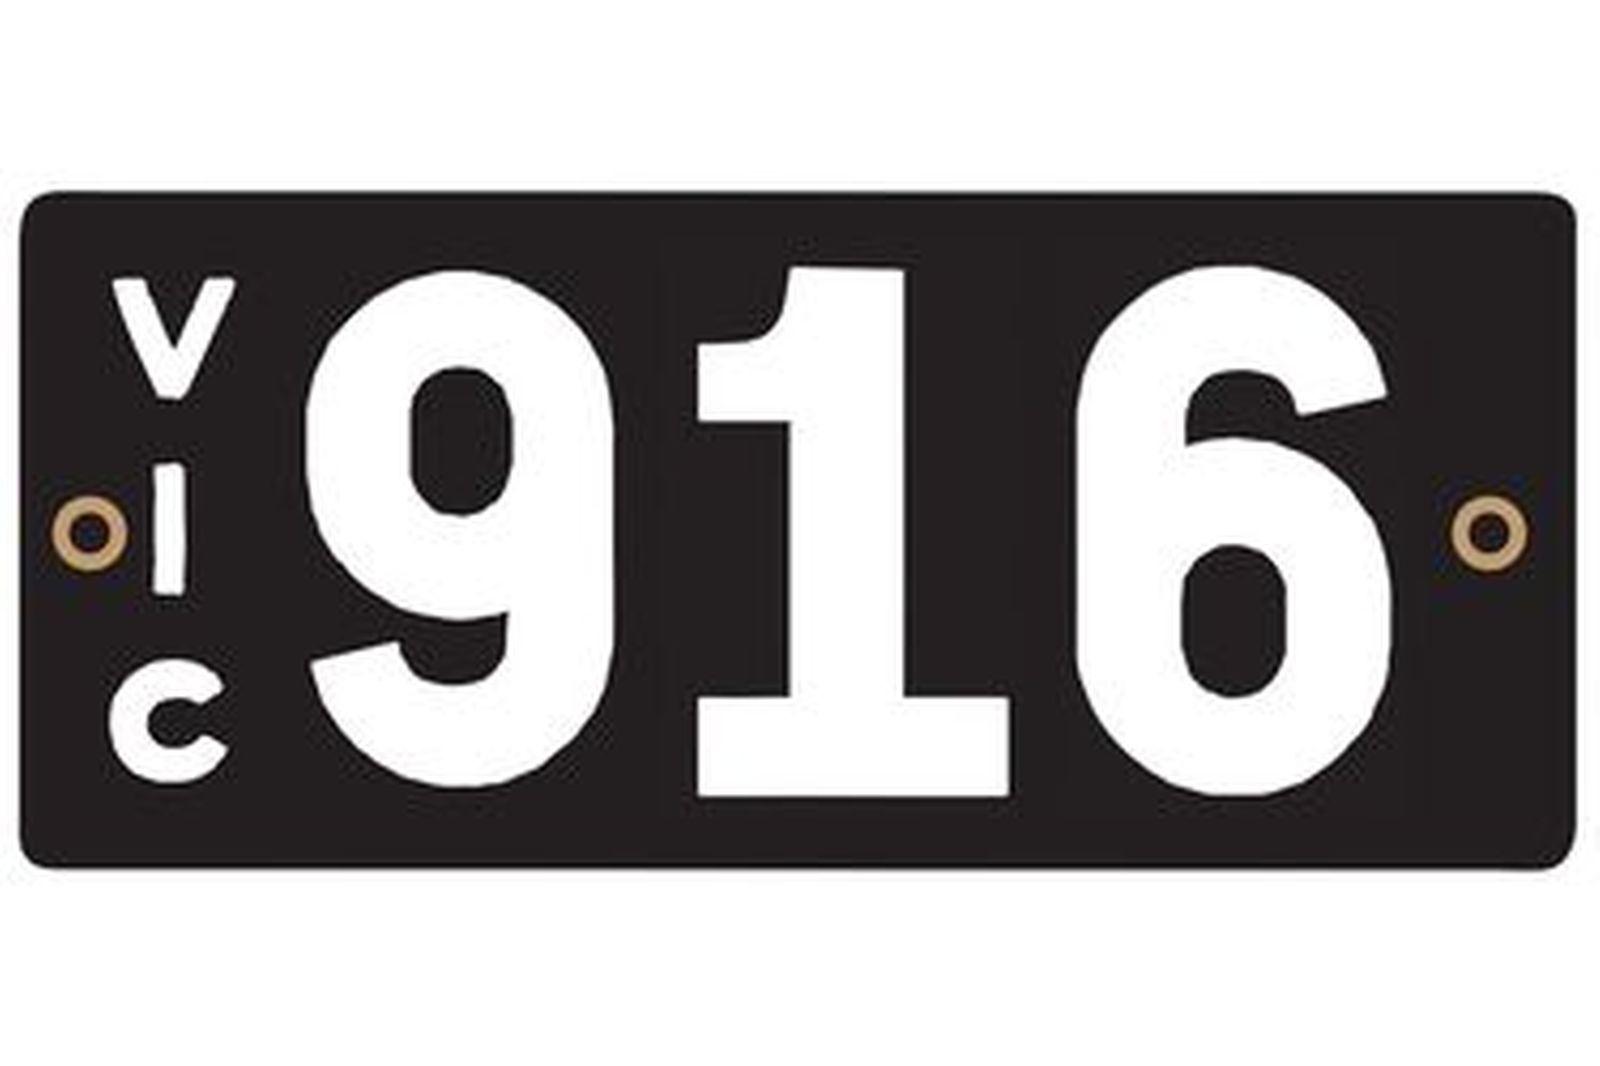 Victorian Heritage Plate '916'